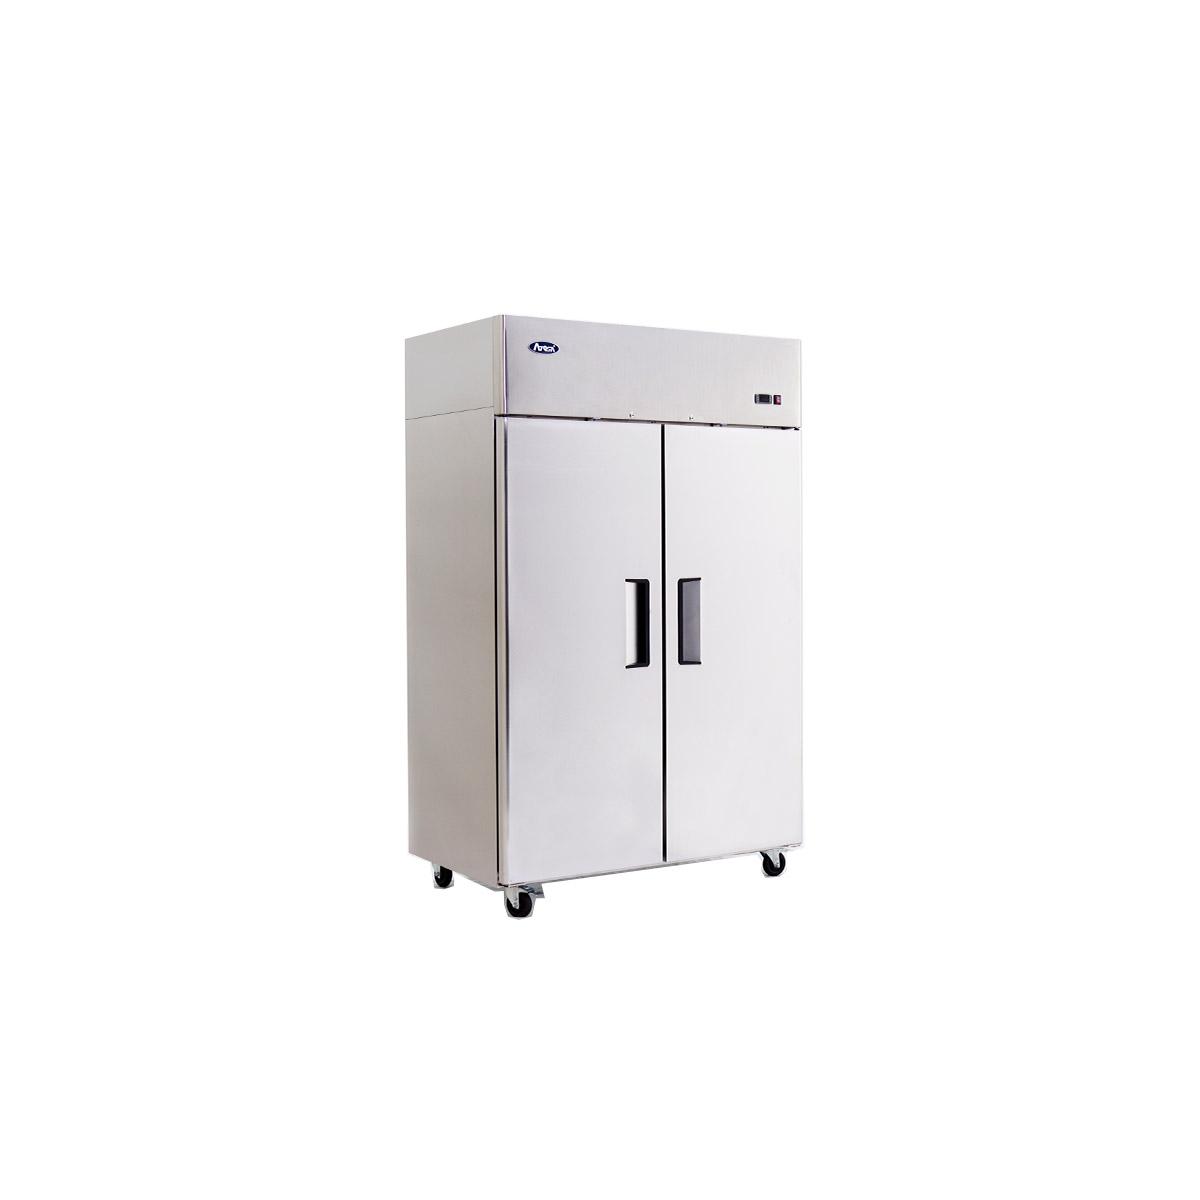 Atosa MBF8114HD Top Mounted Double Door Freezer 1300 Litres